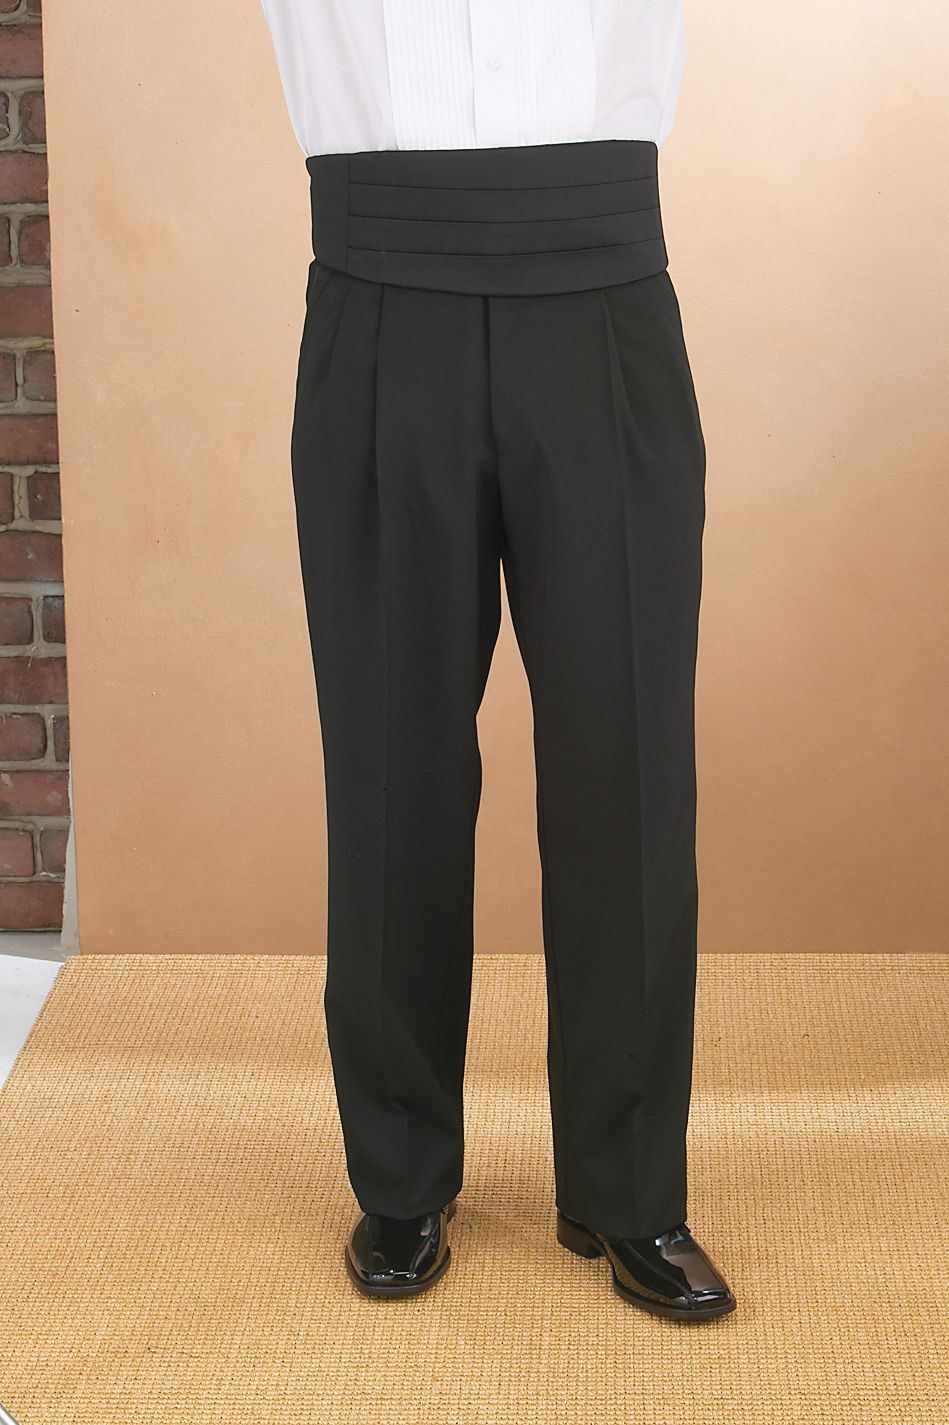 Career/Performance apparel. www.JAlanFormalwear.com ...